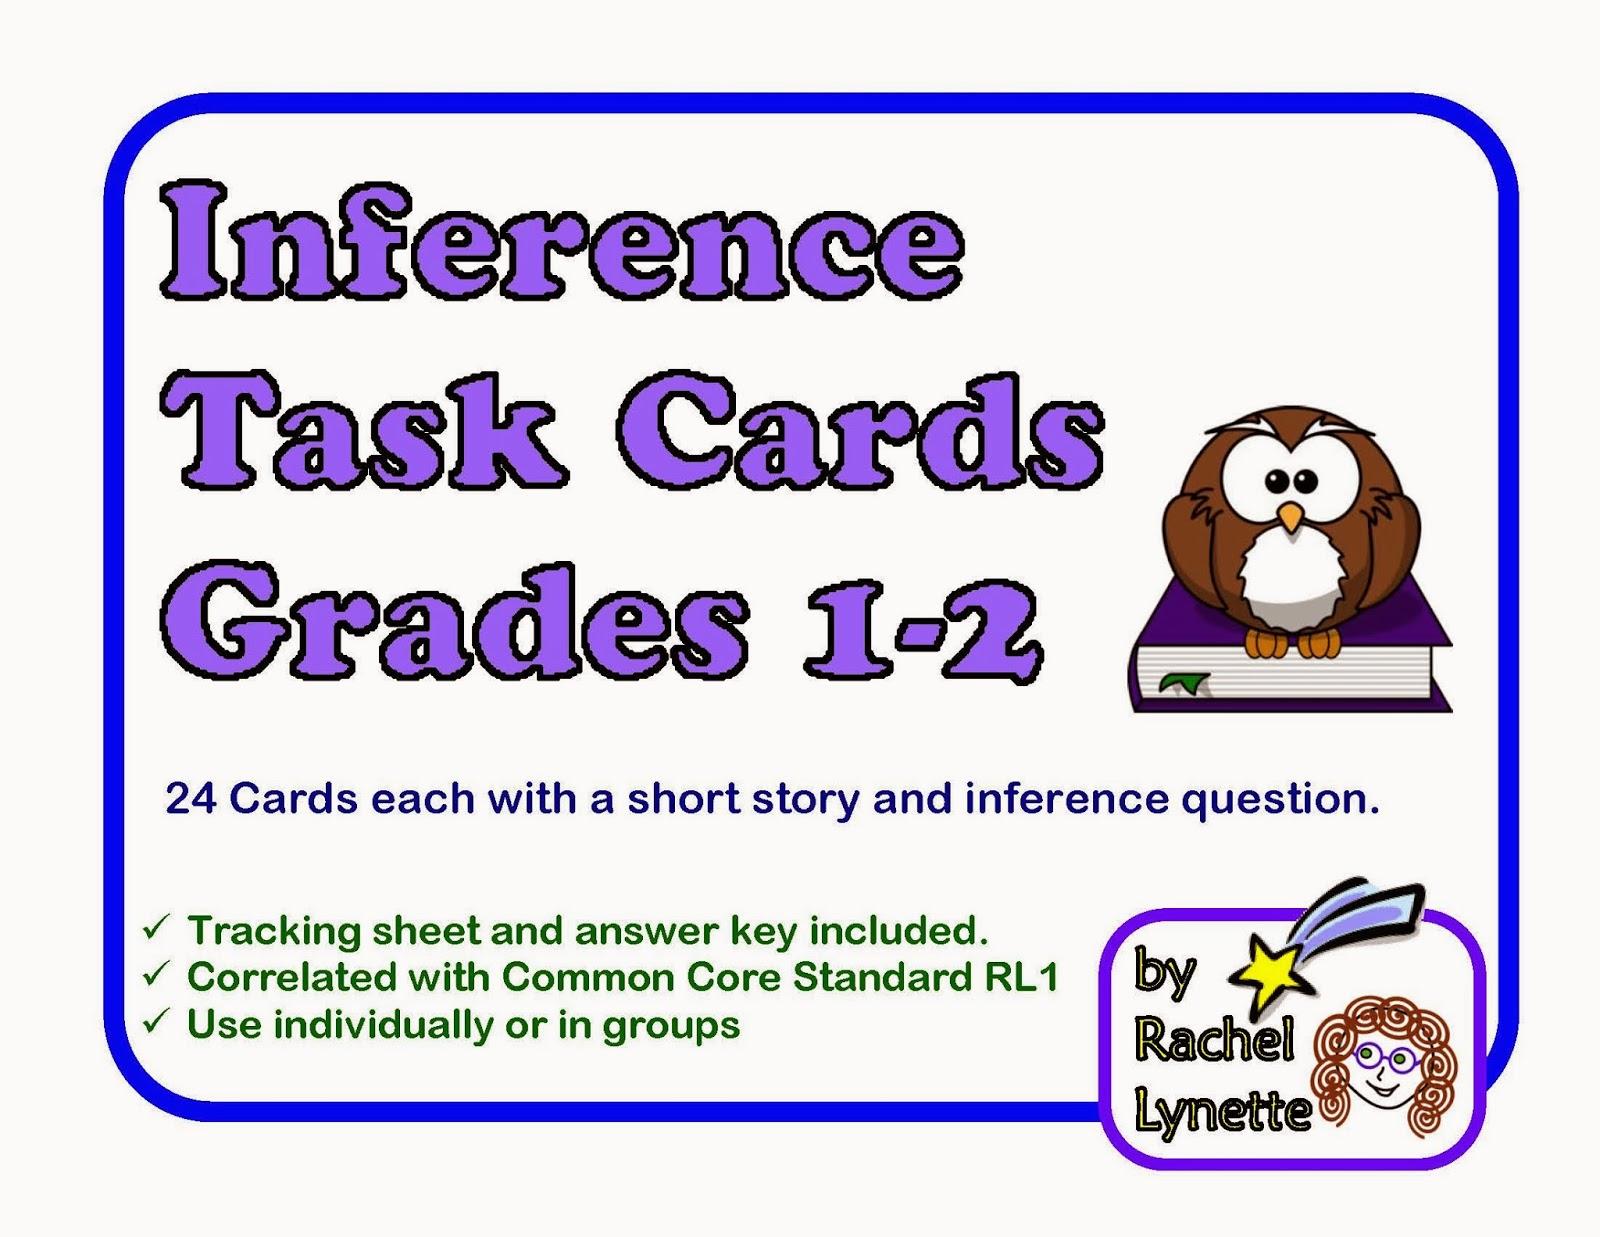 Demoinferencetaskcardsshortstorycardsforgrades Page 1